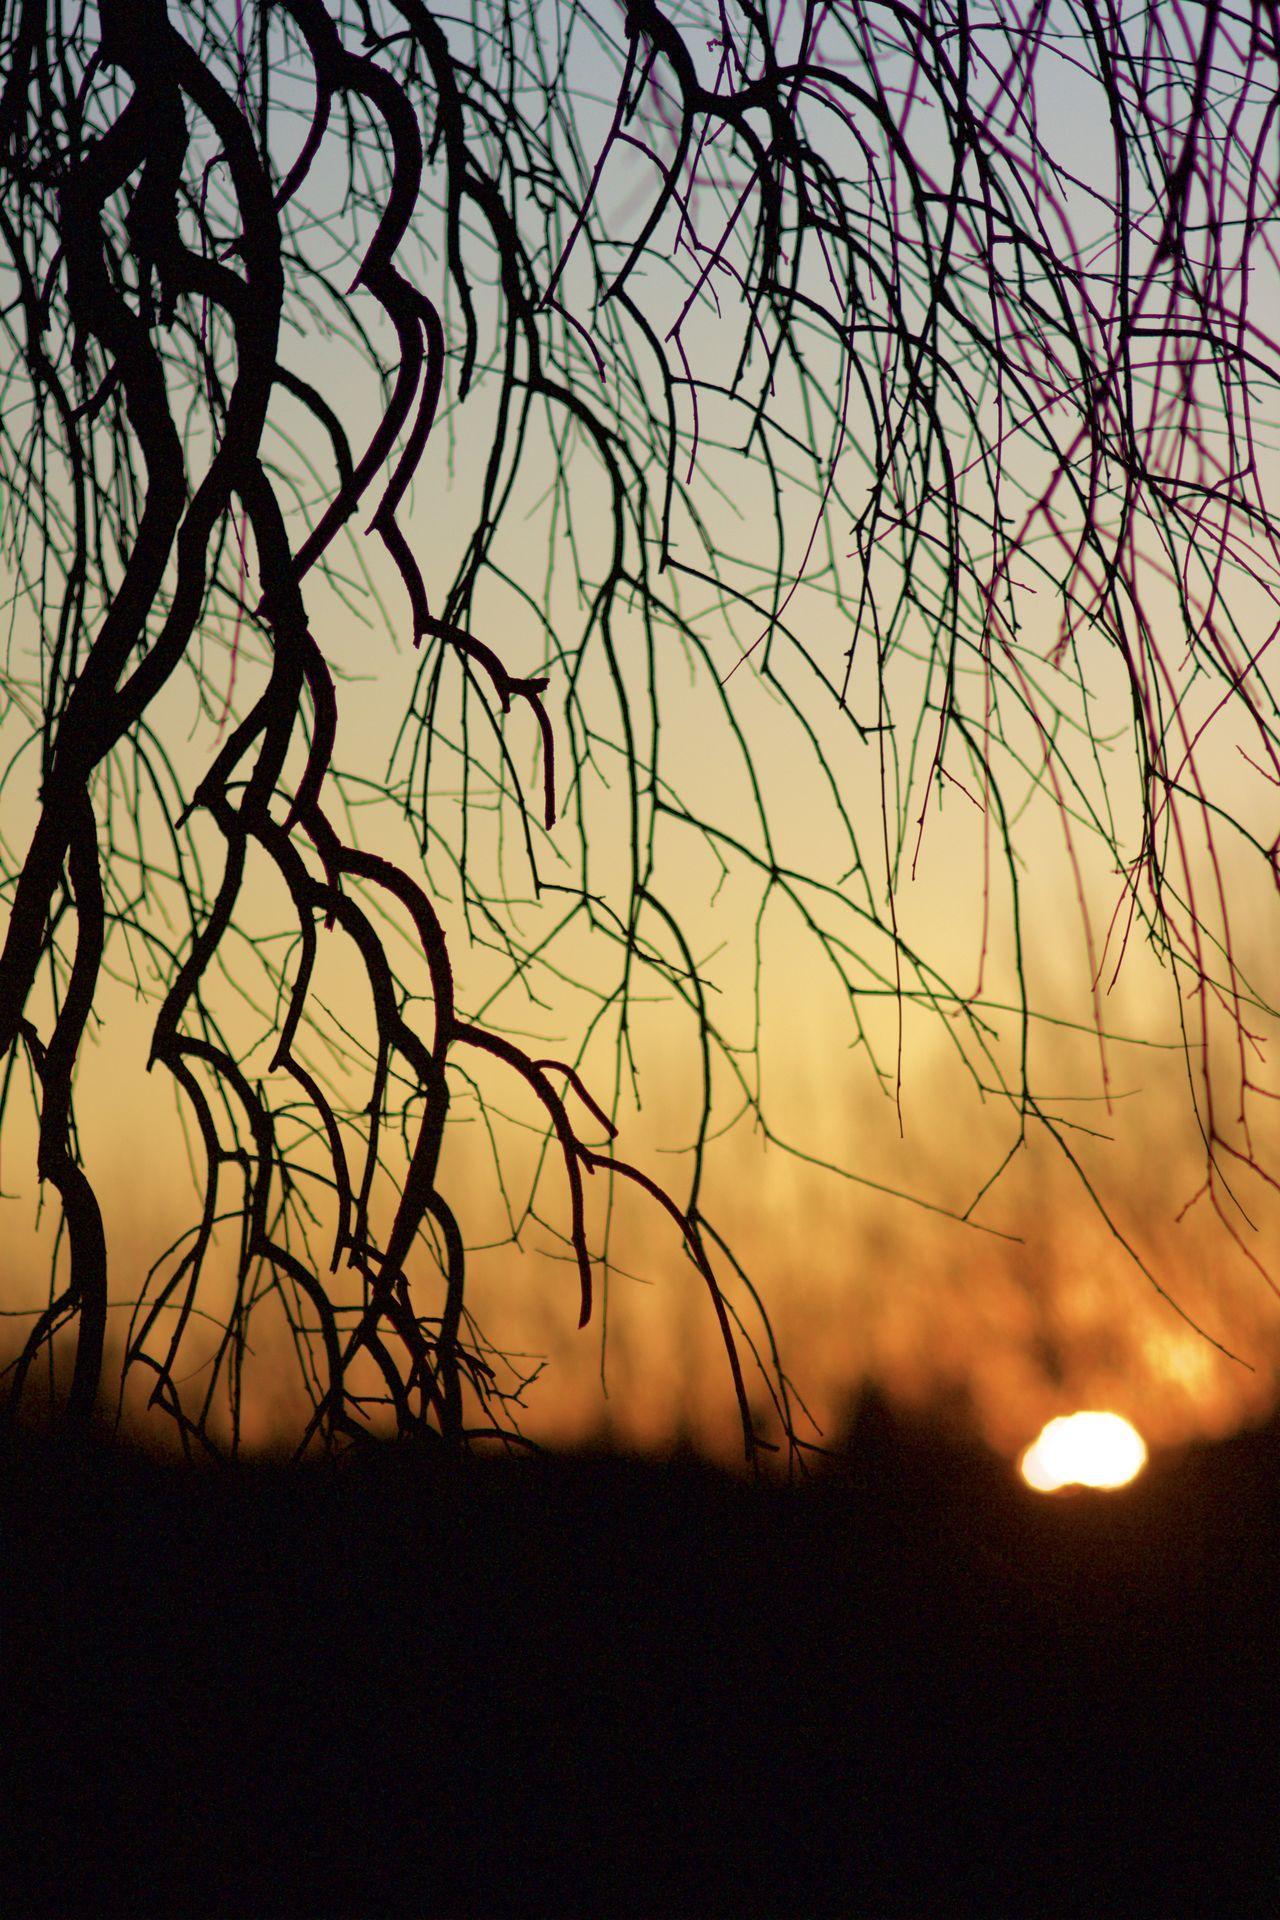 Tree Silhouette Atmosphere Branch Glowing Italy Light Nature Silhouette Sun Sunset Tree Tree Silhouette